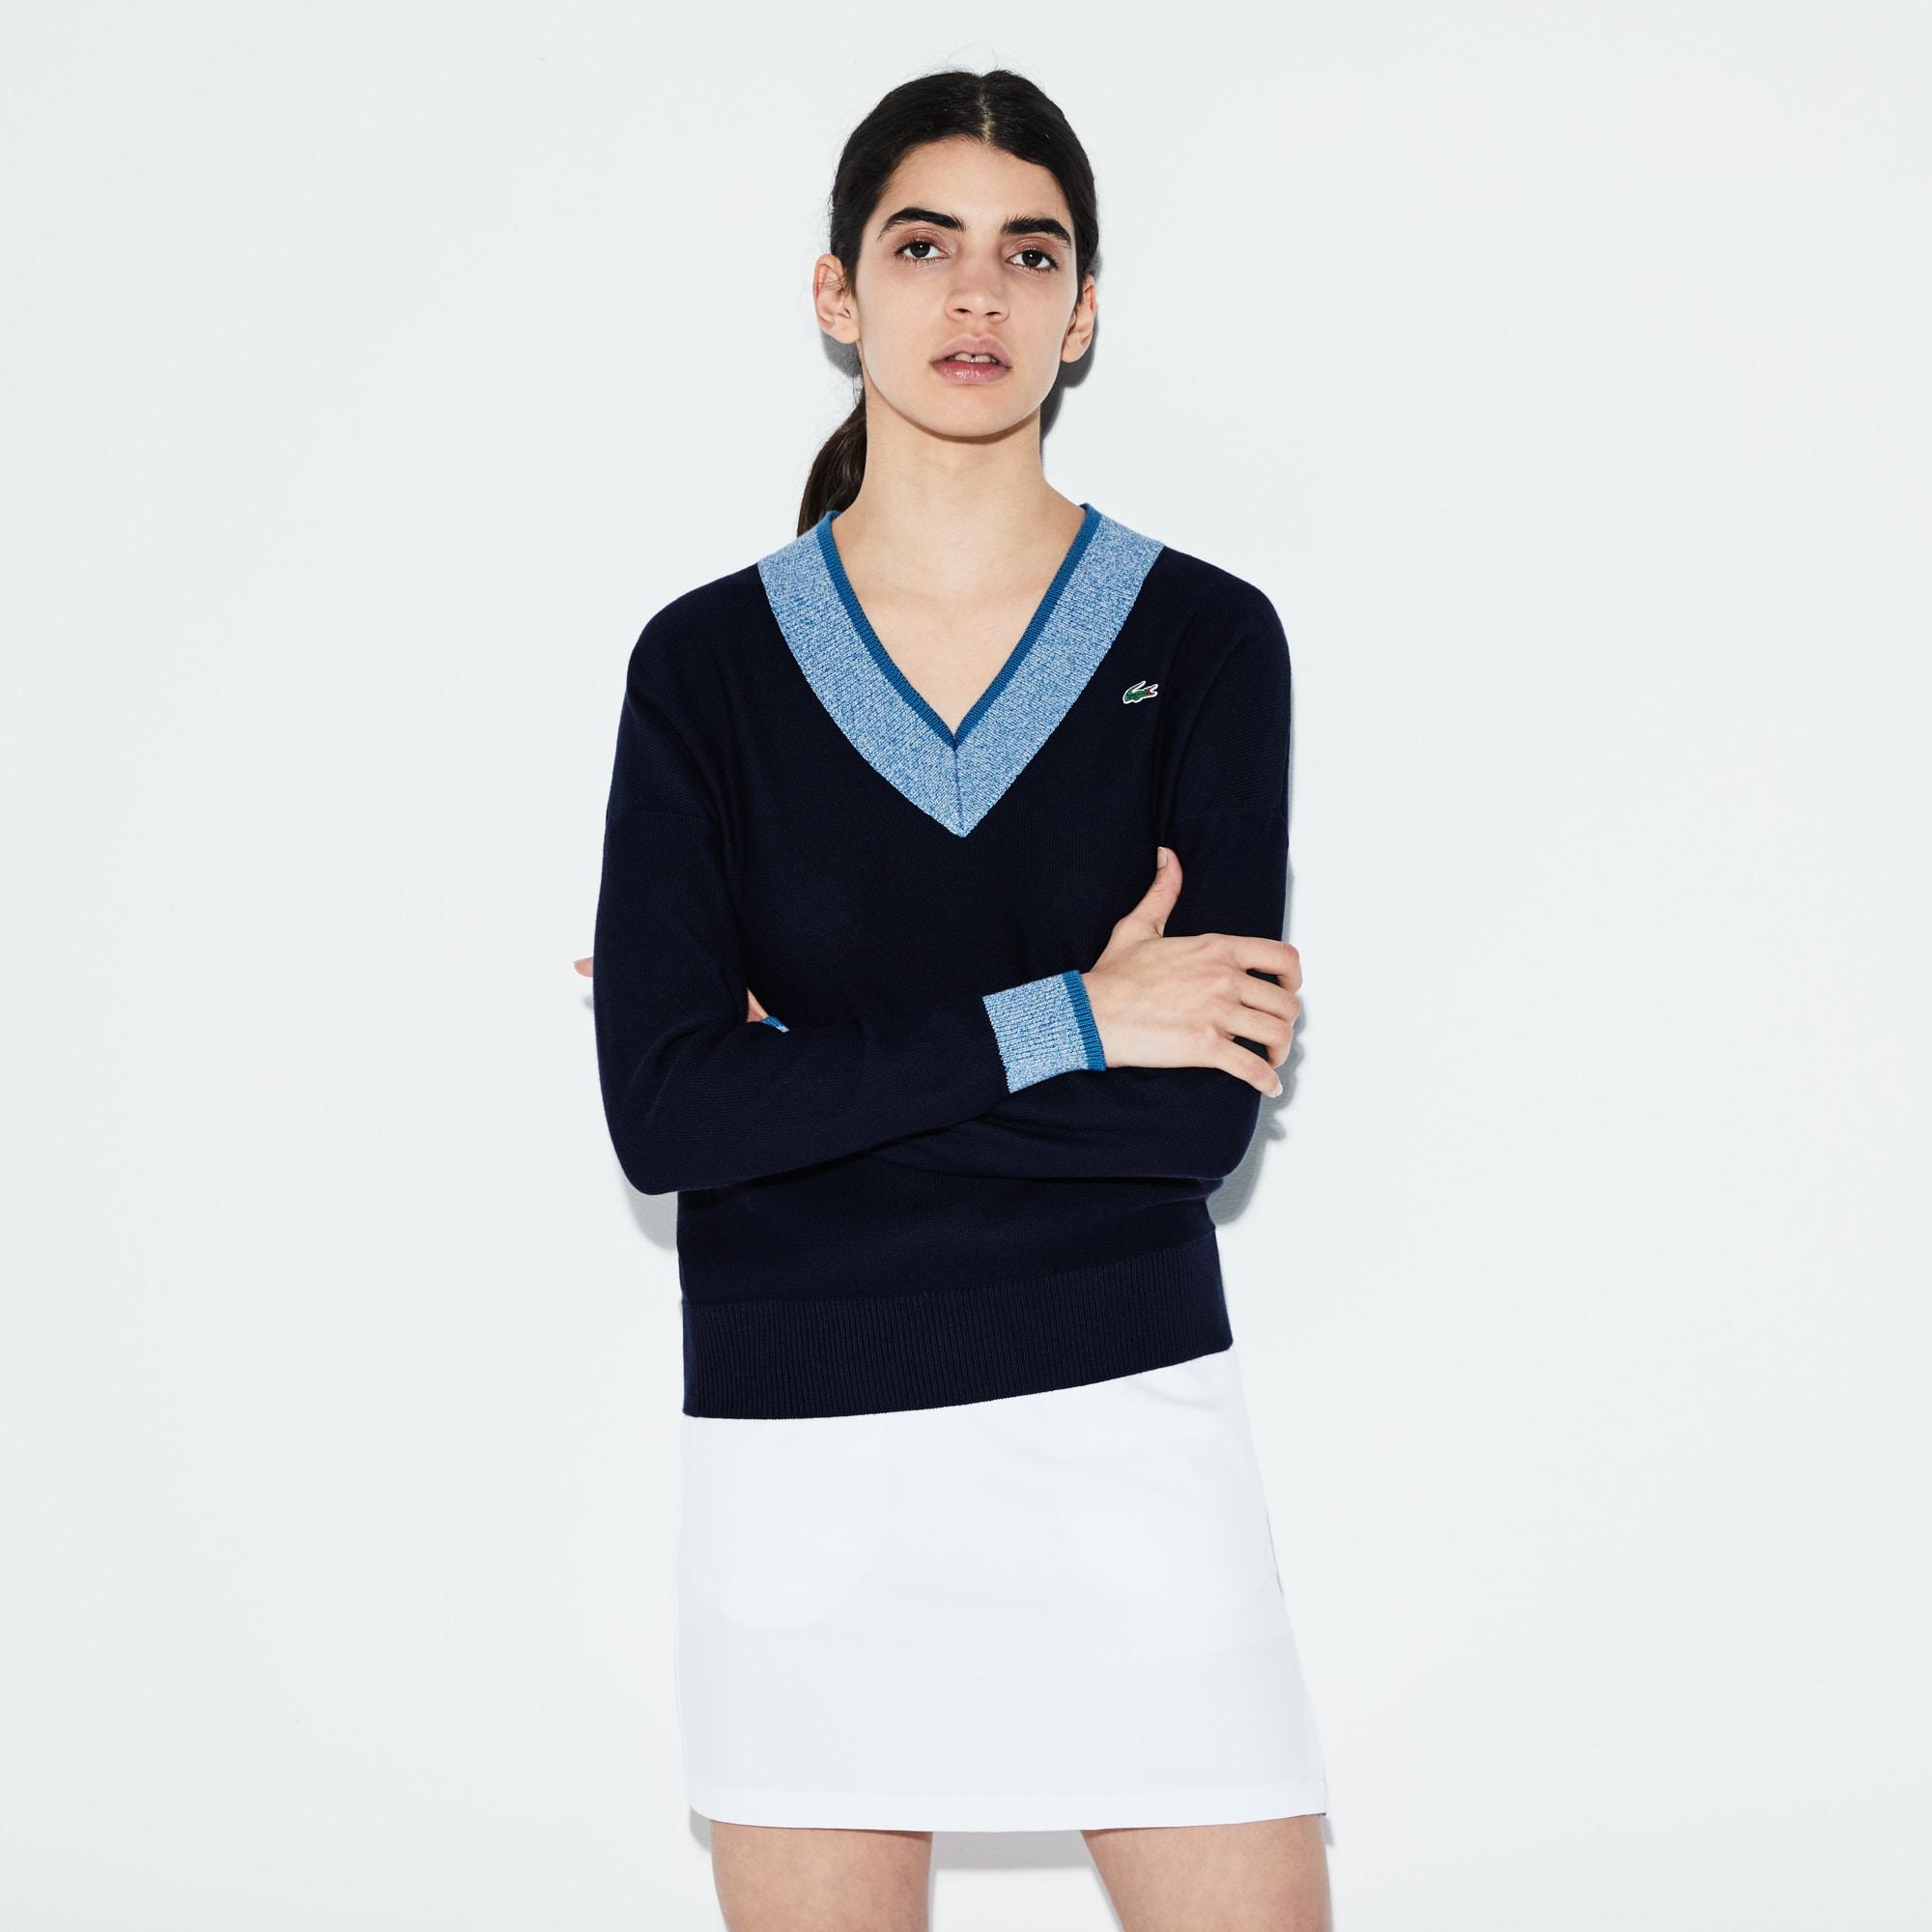 Damen LACOSTE SPORT Golf-Pullover mit V-Ausschnitt